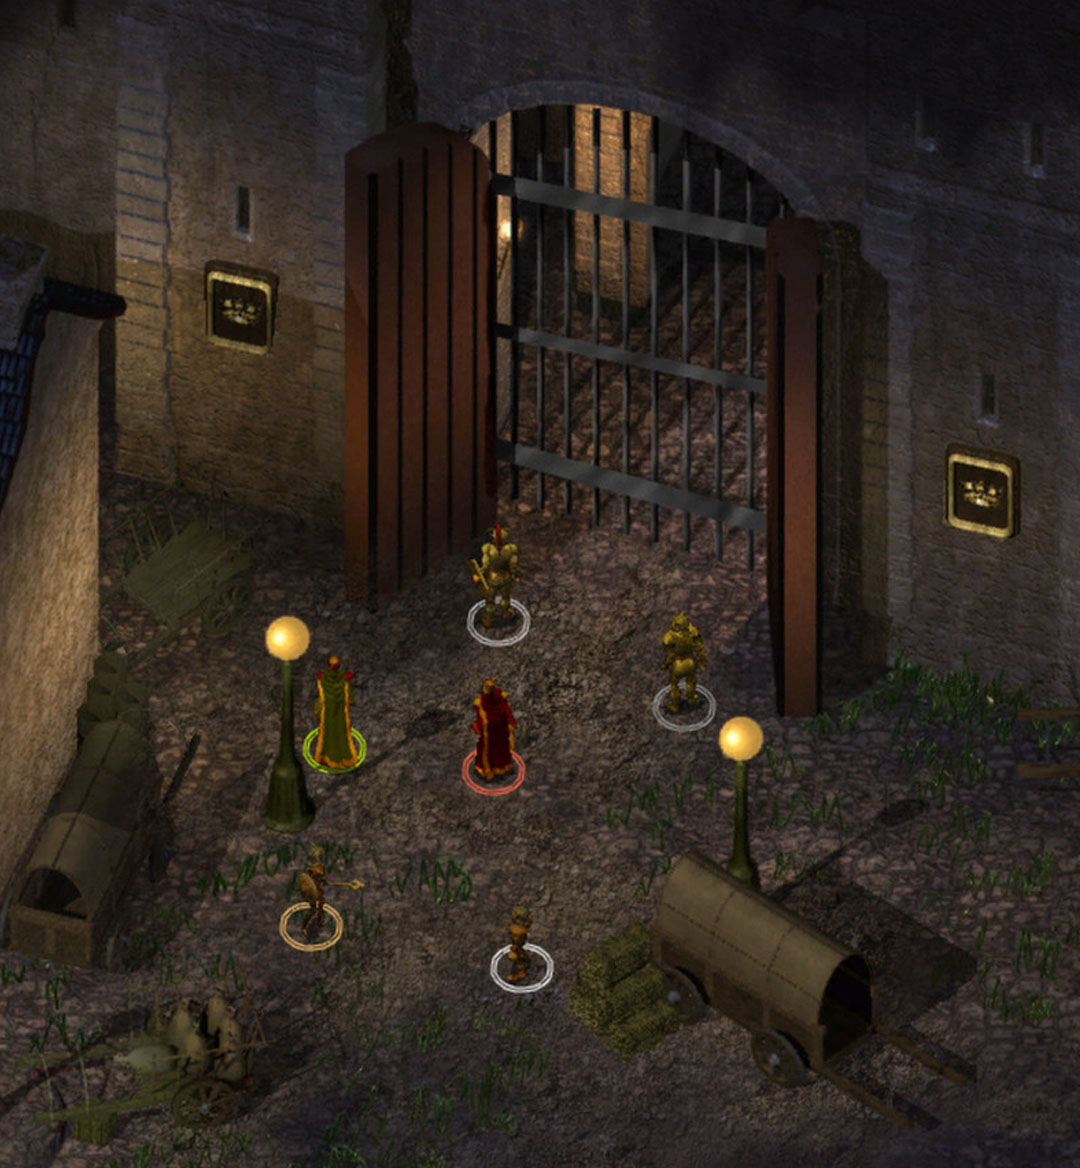 games like baldurs gate mobile